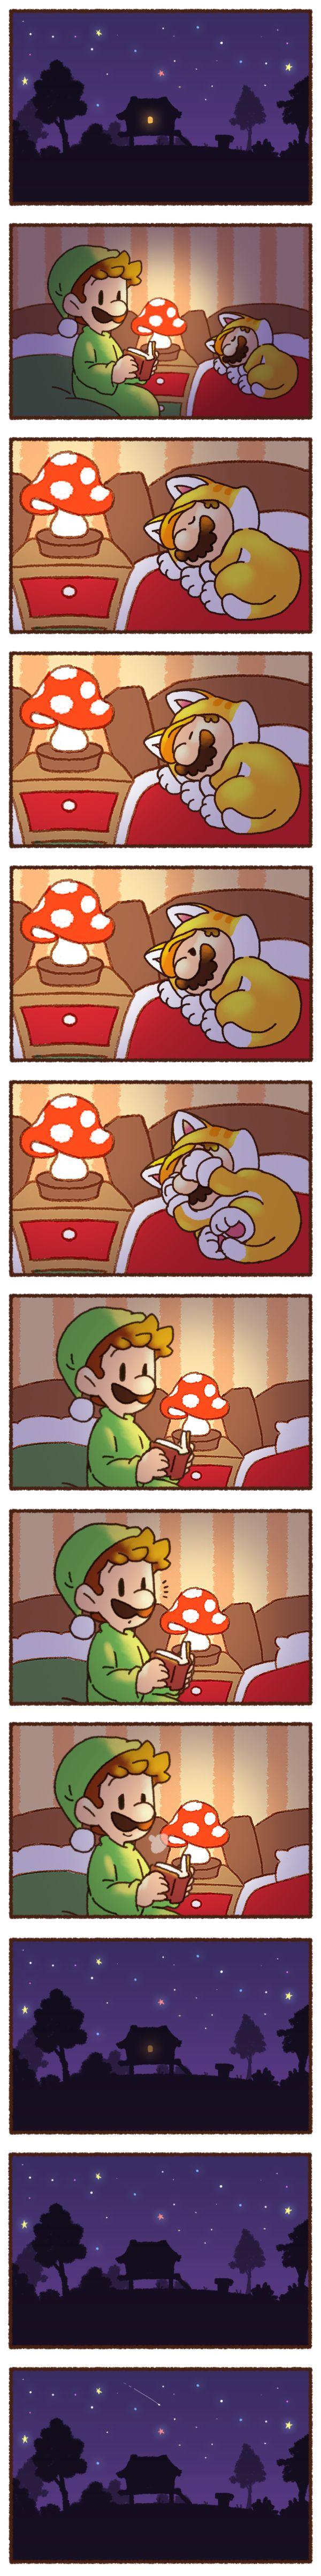 #Mario #Luigi #comic